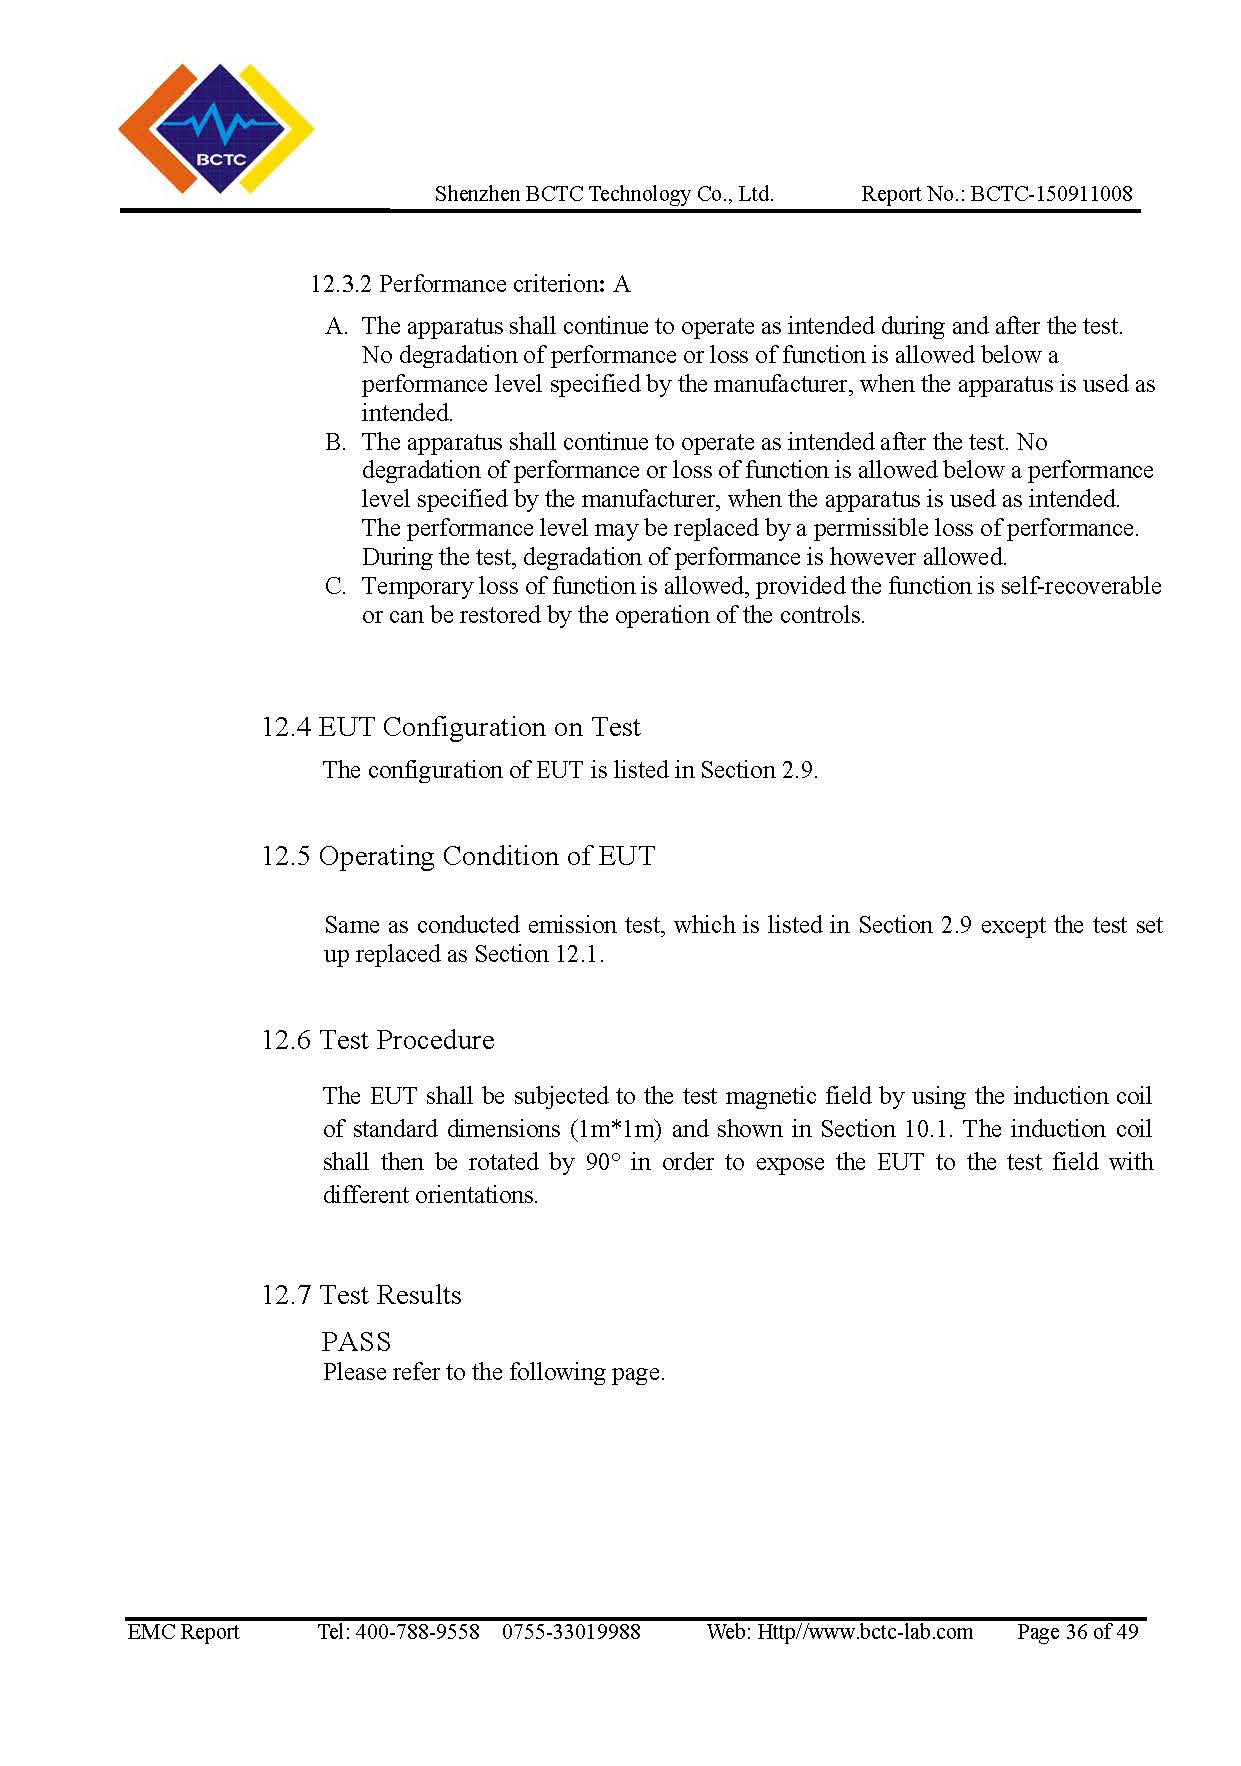 breathe-safe-ce-report-page-36.jpg